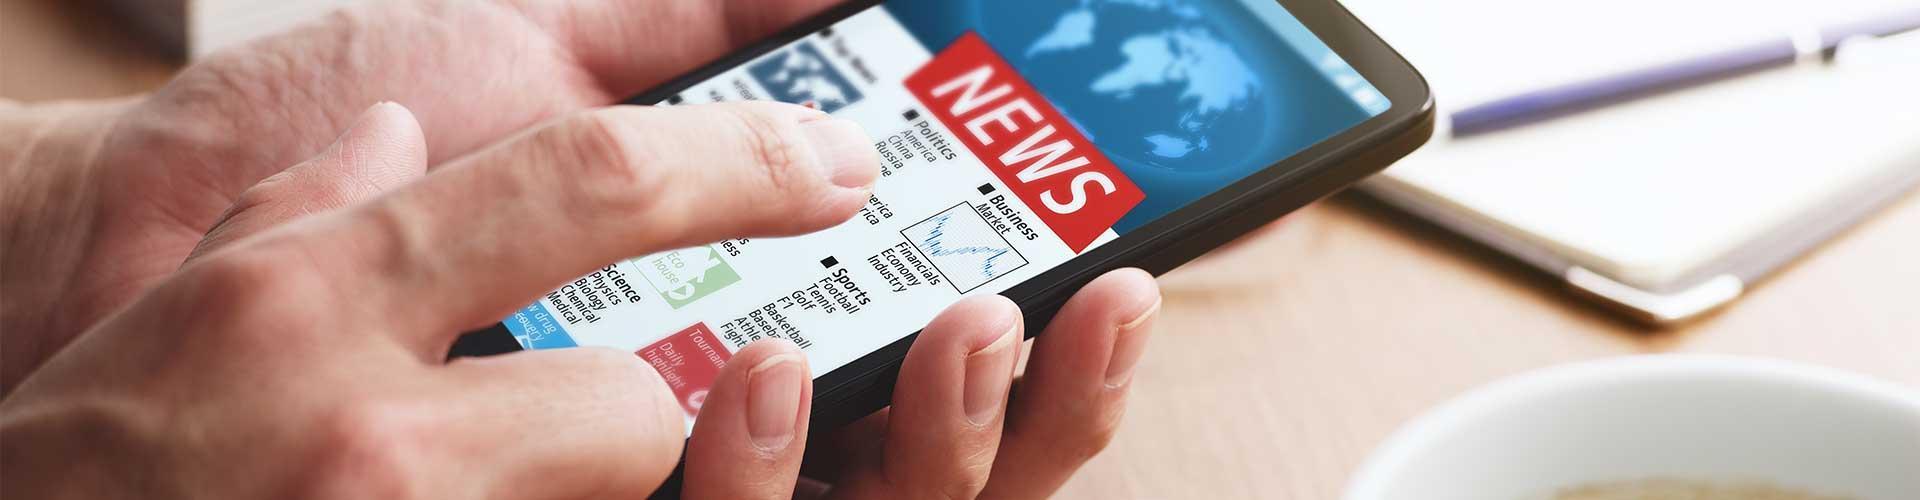 Stock photo of navigating news on smartphone